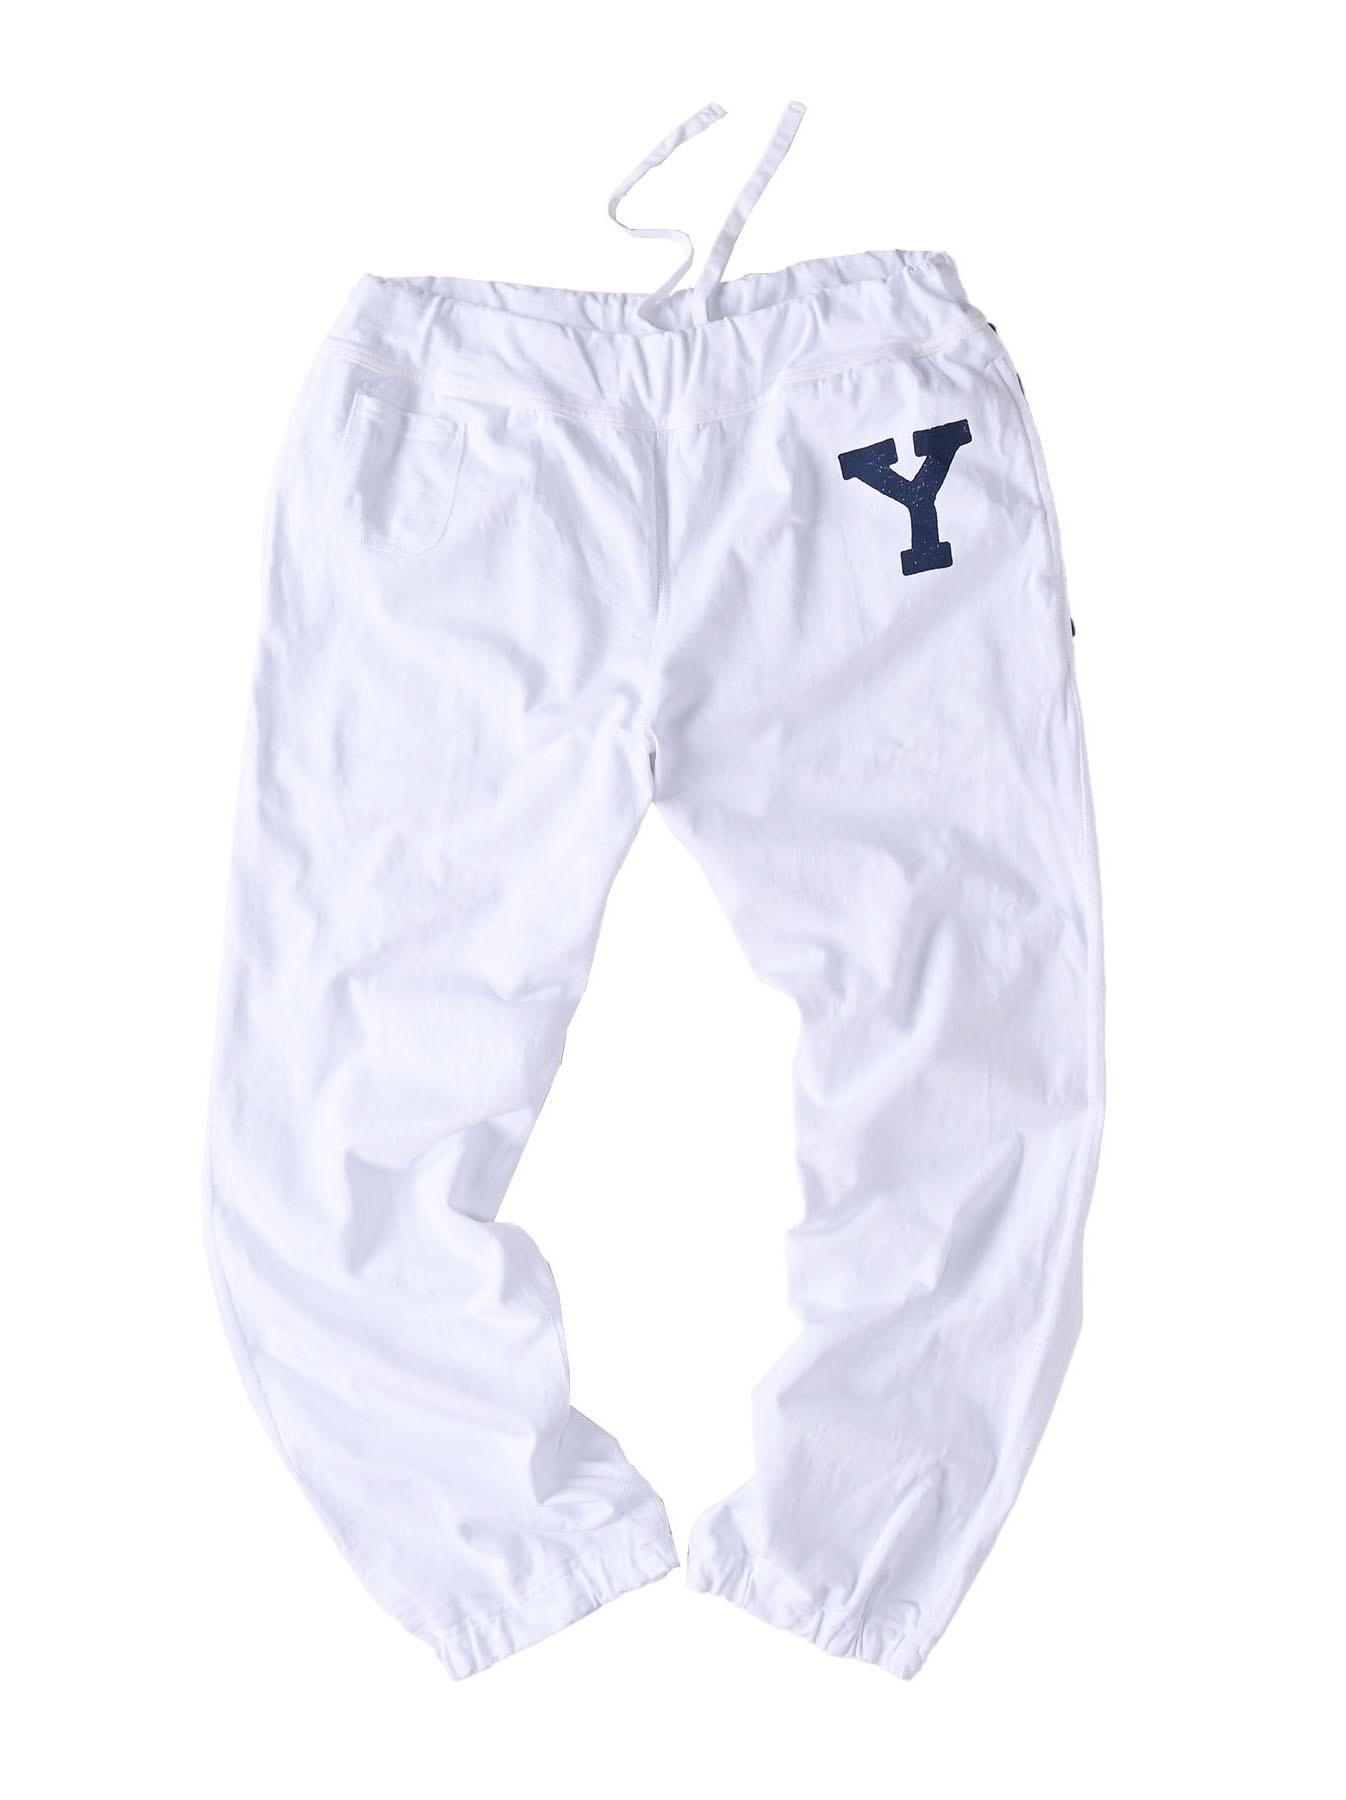 Dekoboko Tenjiku Regatta Pants (0621)-1